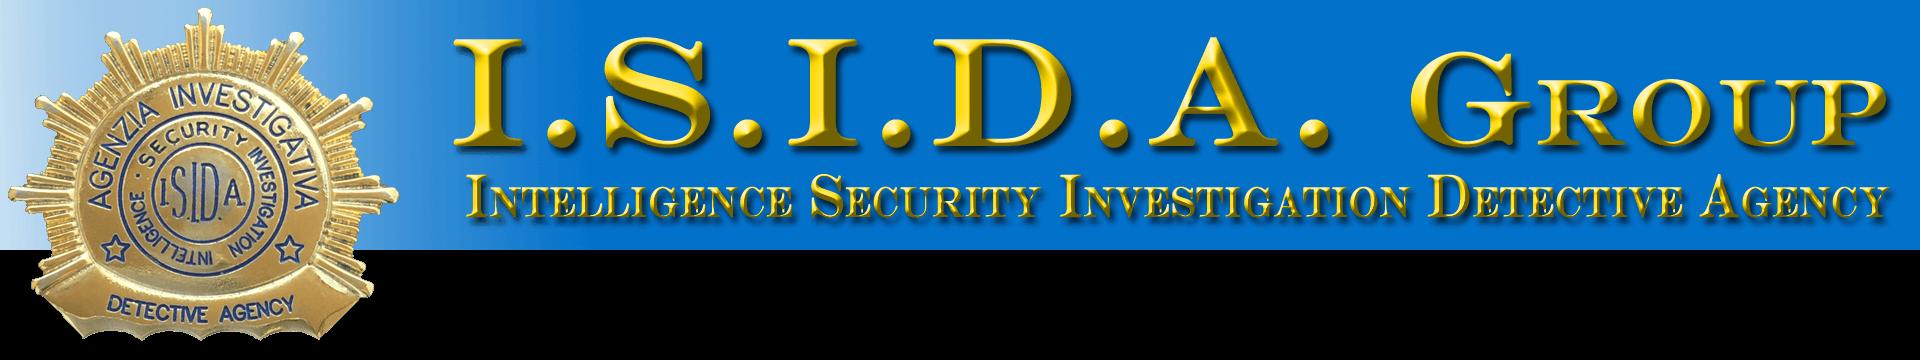 I.S.I.D.A. GROUP investigazioni documenta indaga verifica